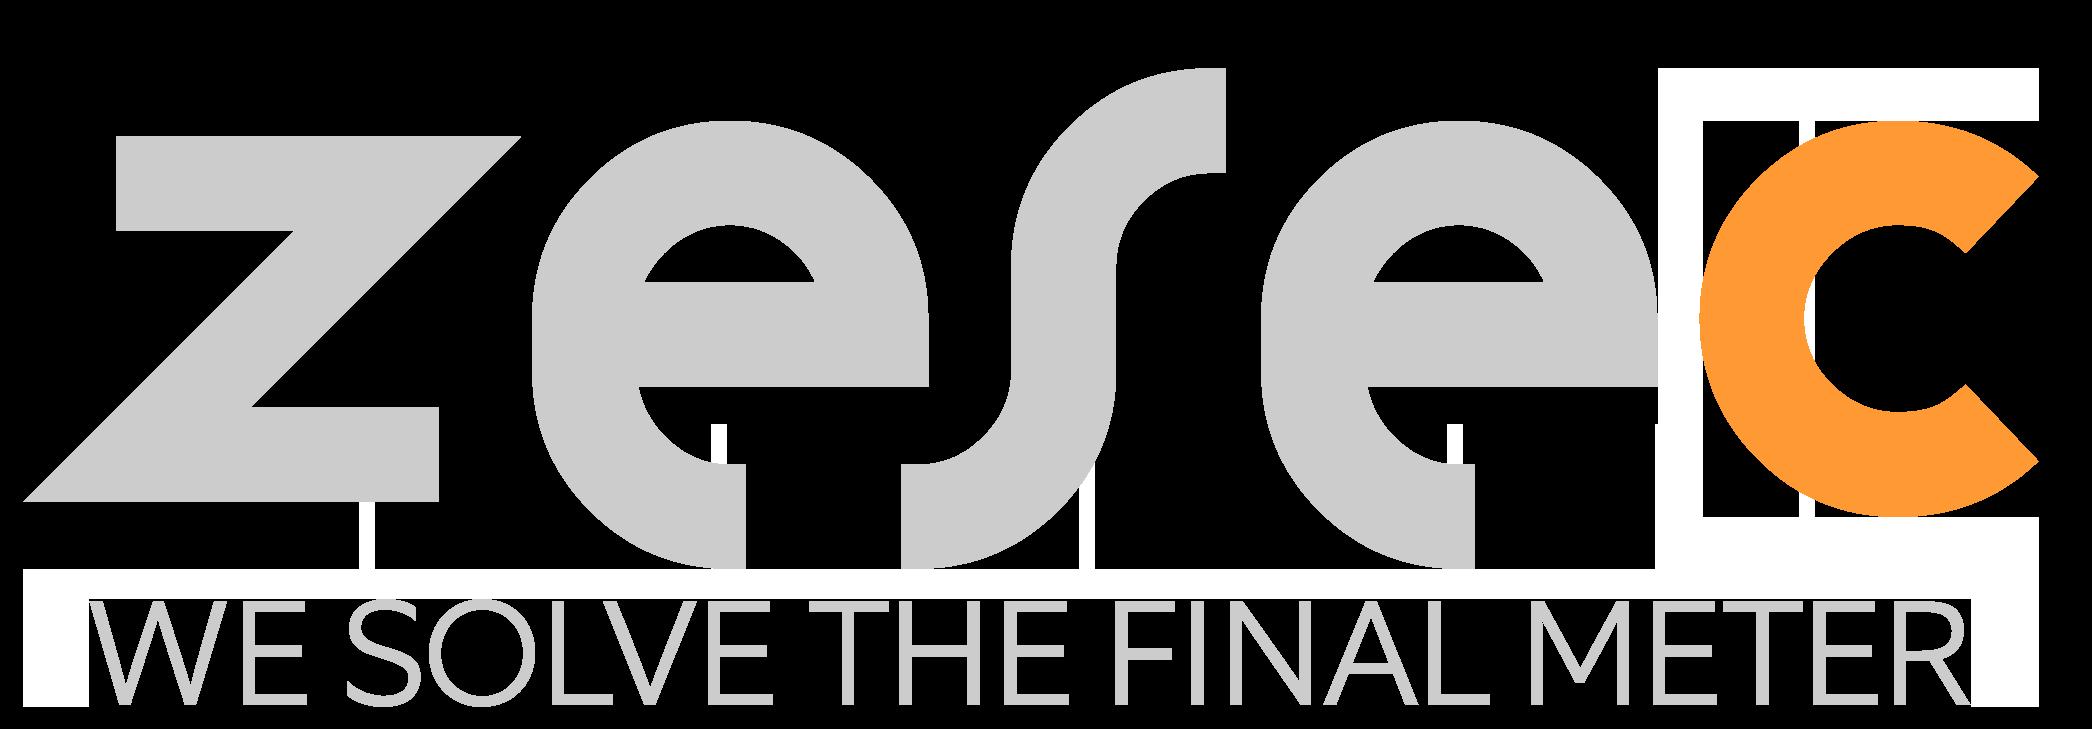 Final-meter-logo.png